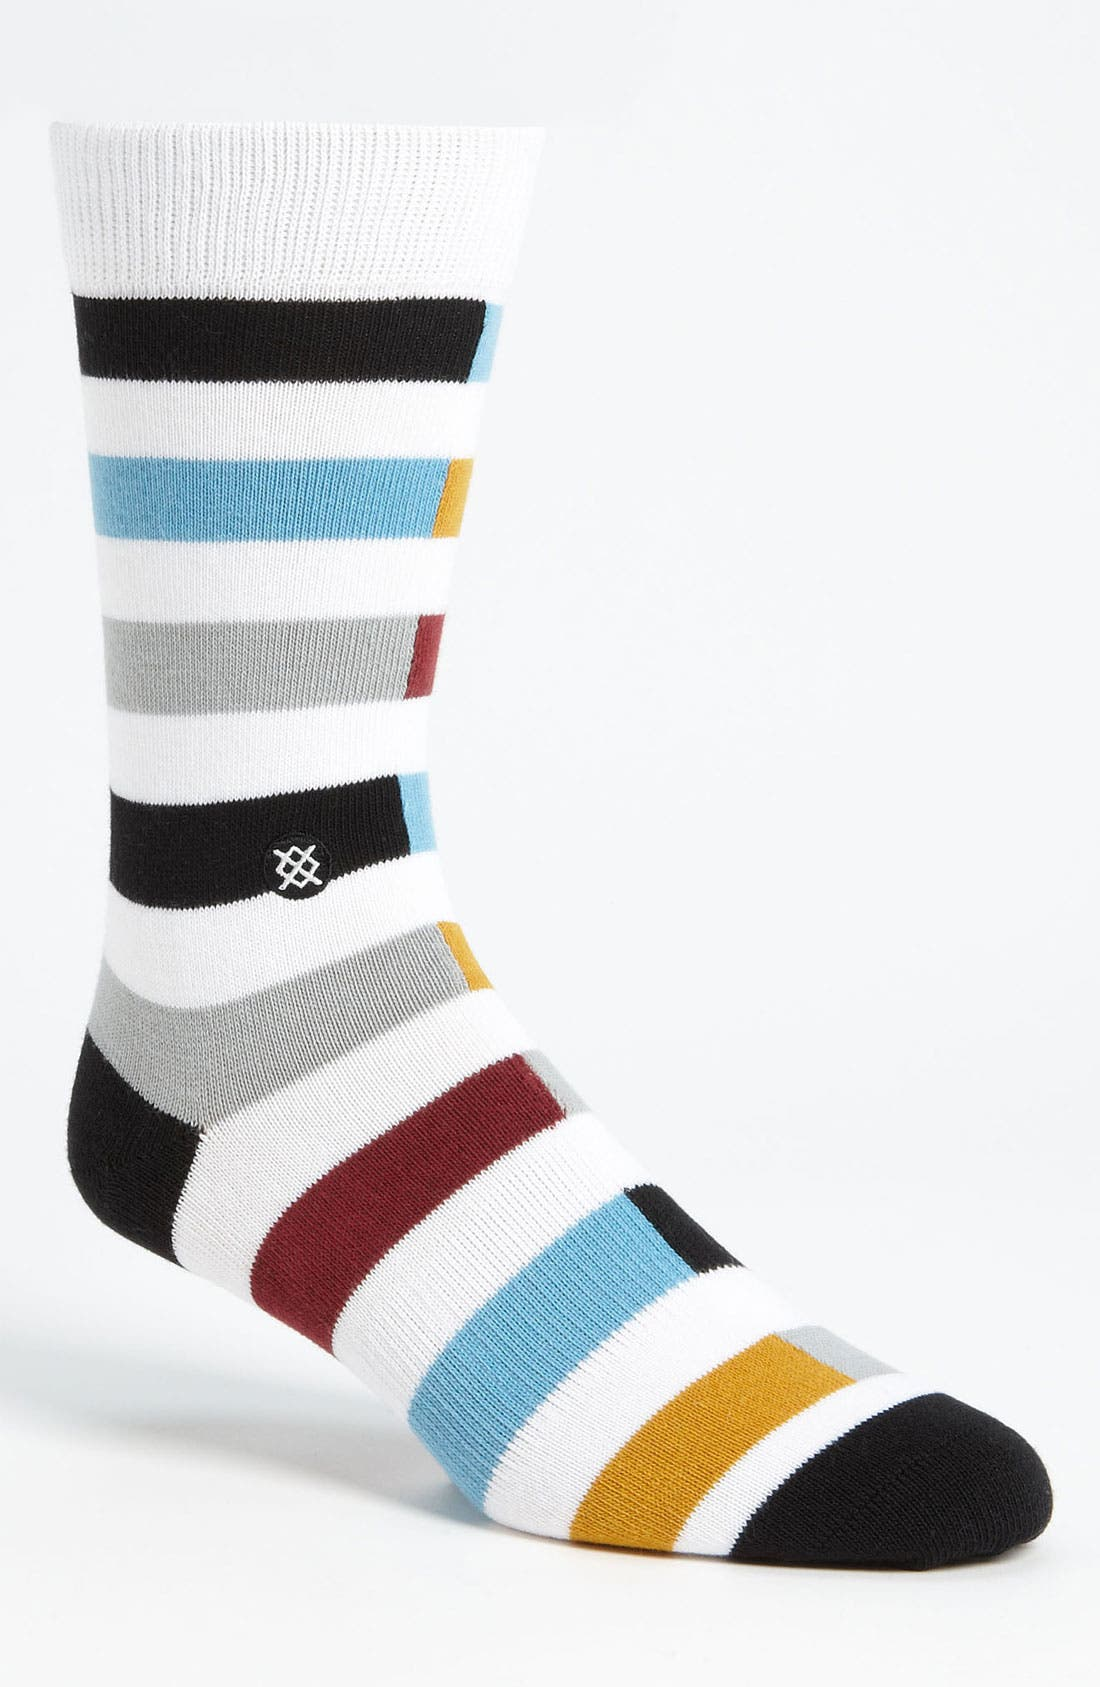 Alternate Image 1 Selected - Stance 'Cooper' Socks